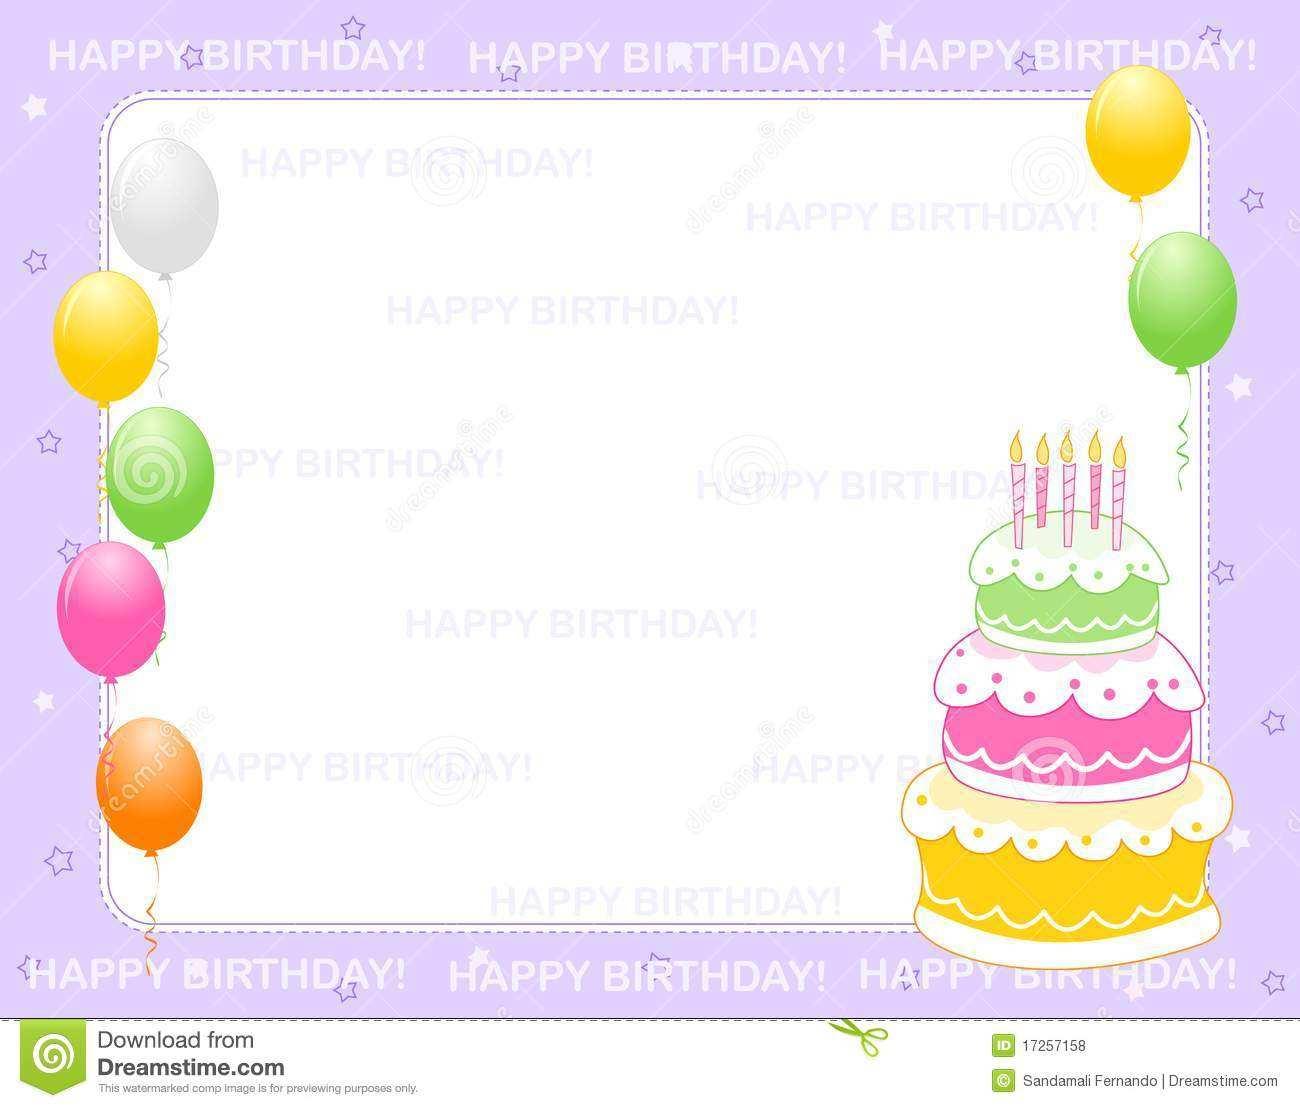 24 Online Birthday Invitation Card Template Word Now with Birthday  Invitation Card Template Word - Cards Design Templates